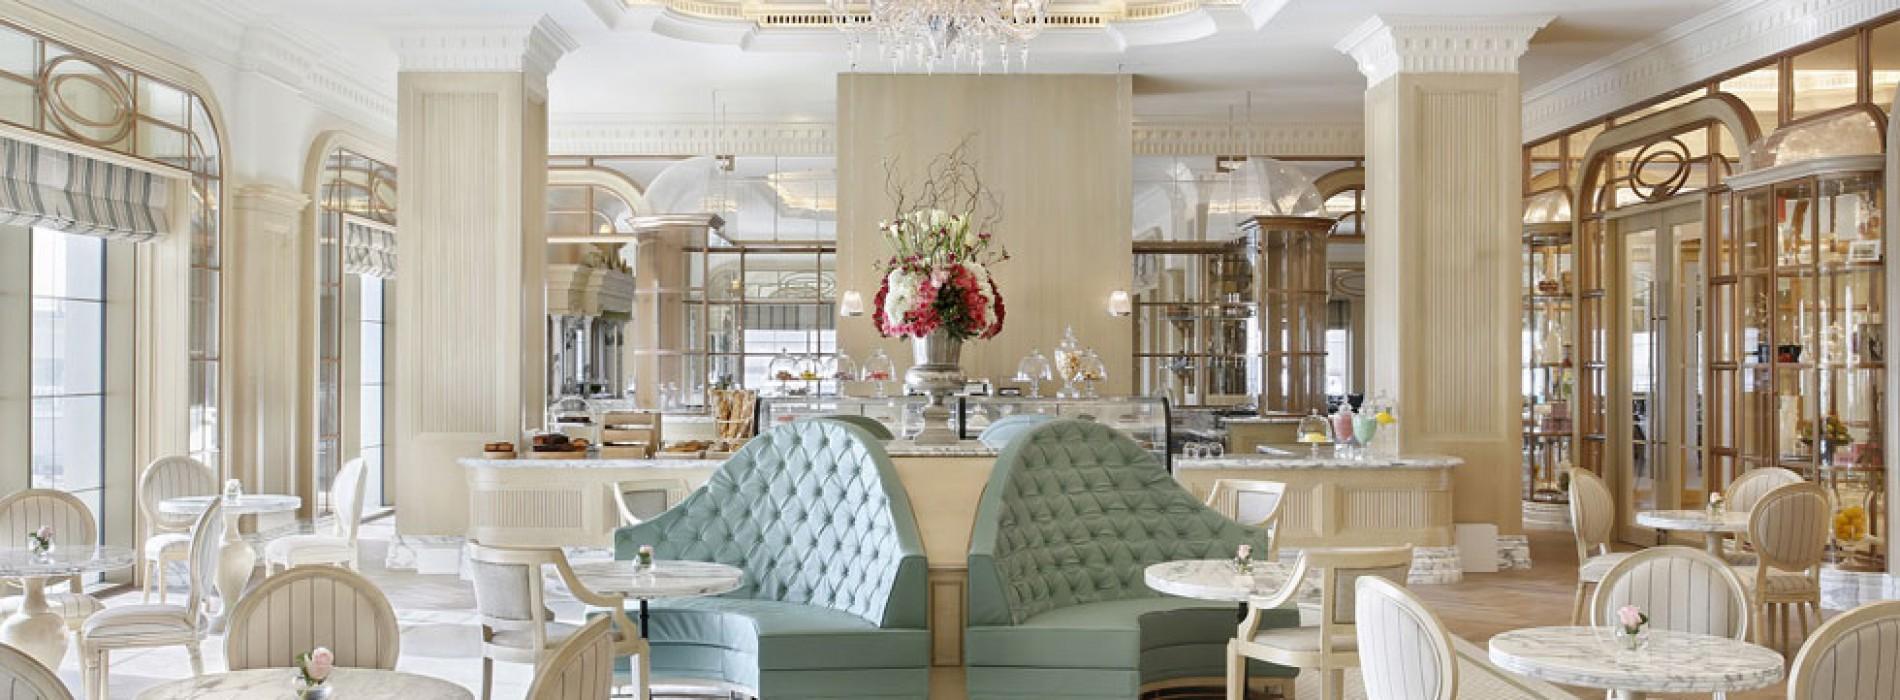 St. Regis Hotels & Resorts debuts in Dubai with new world address in Al Habtoor City